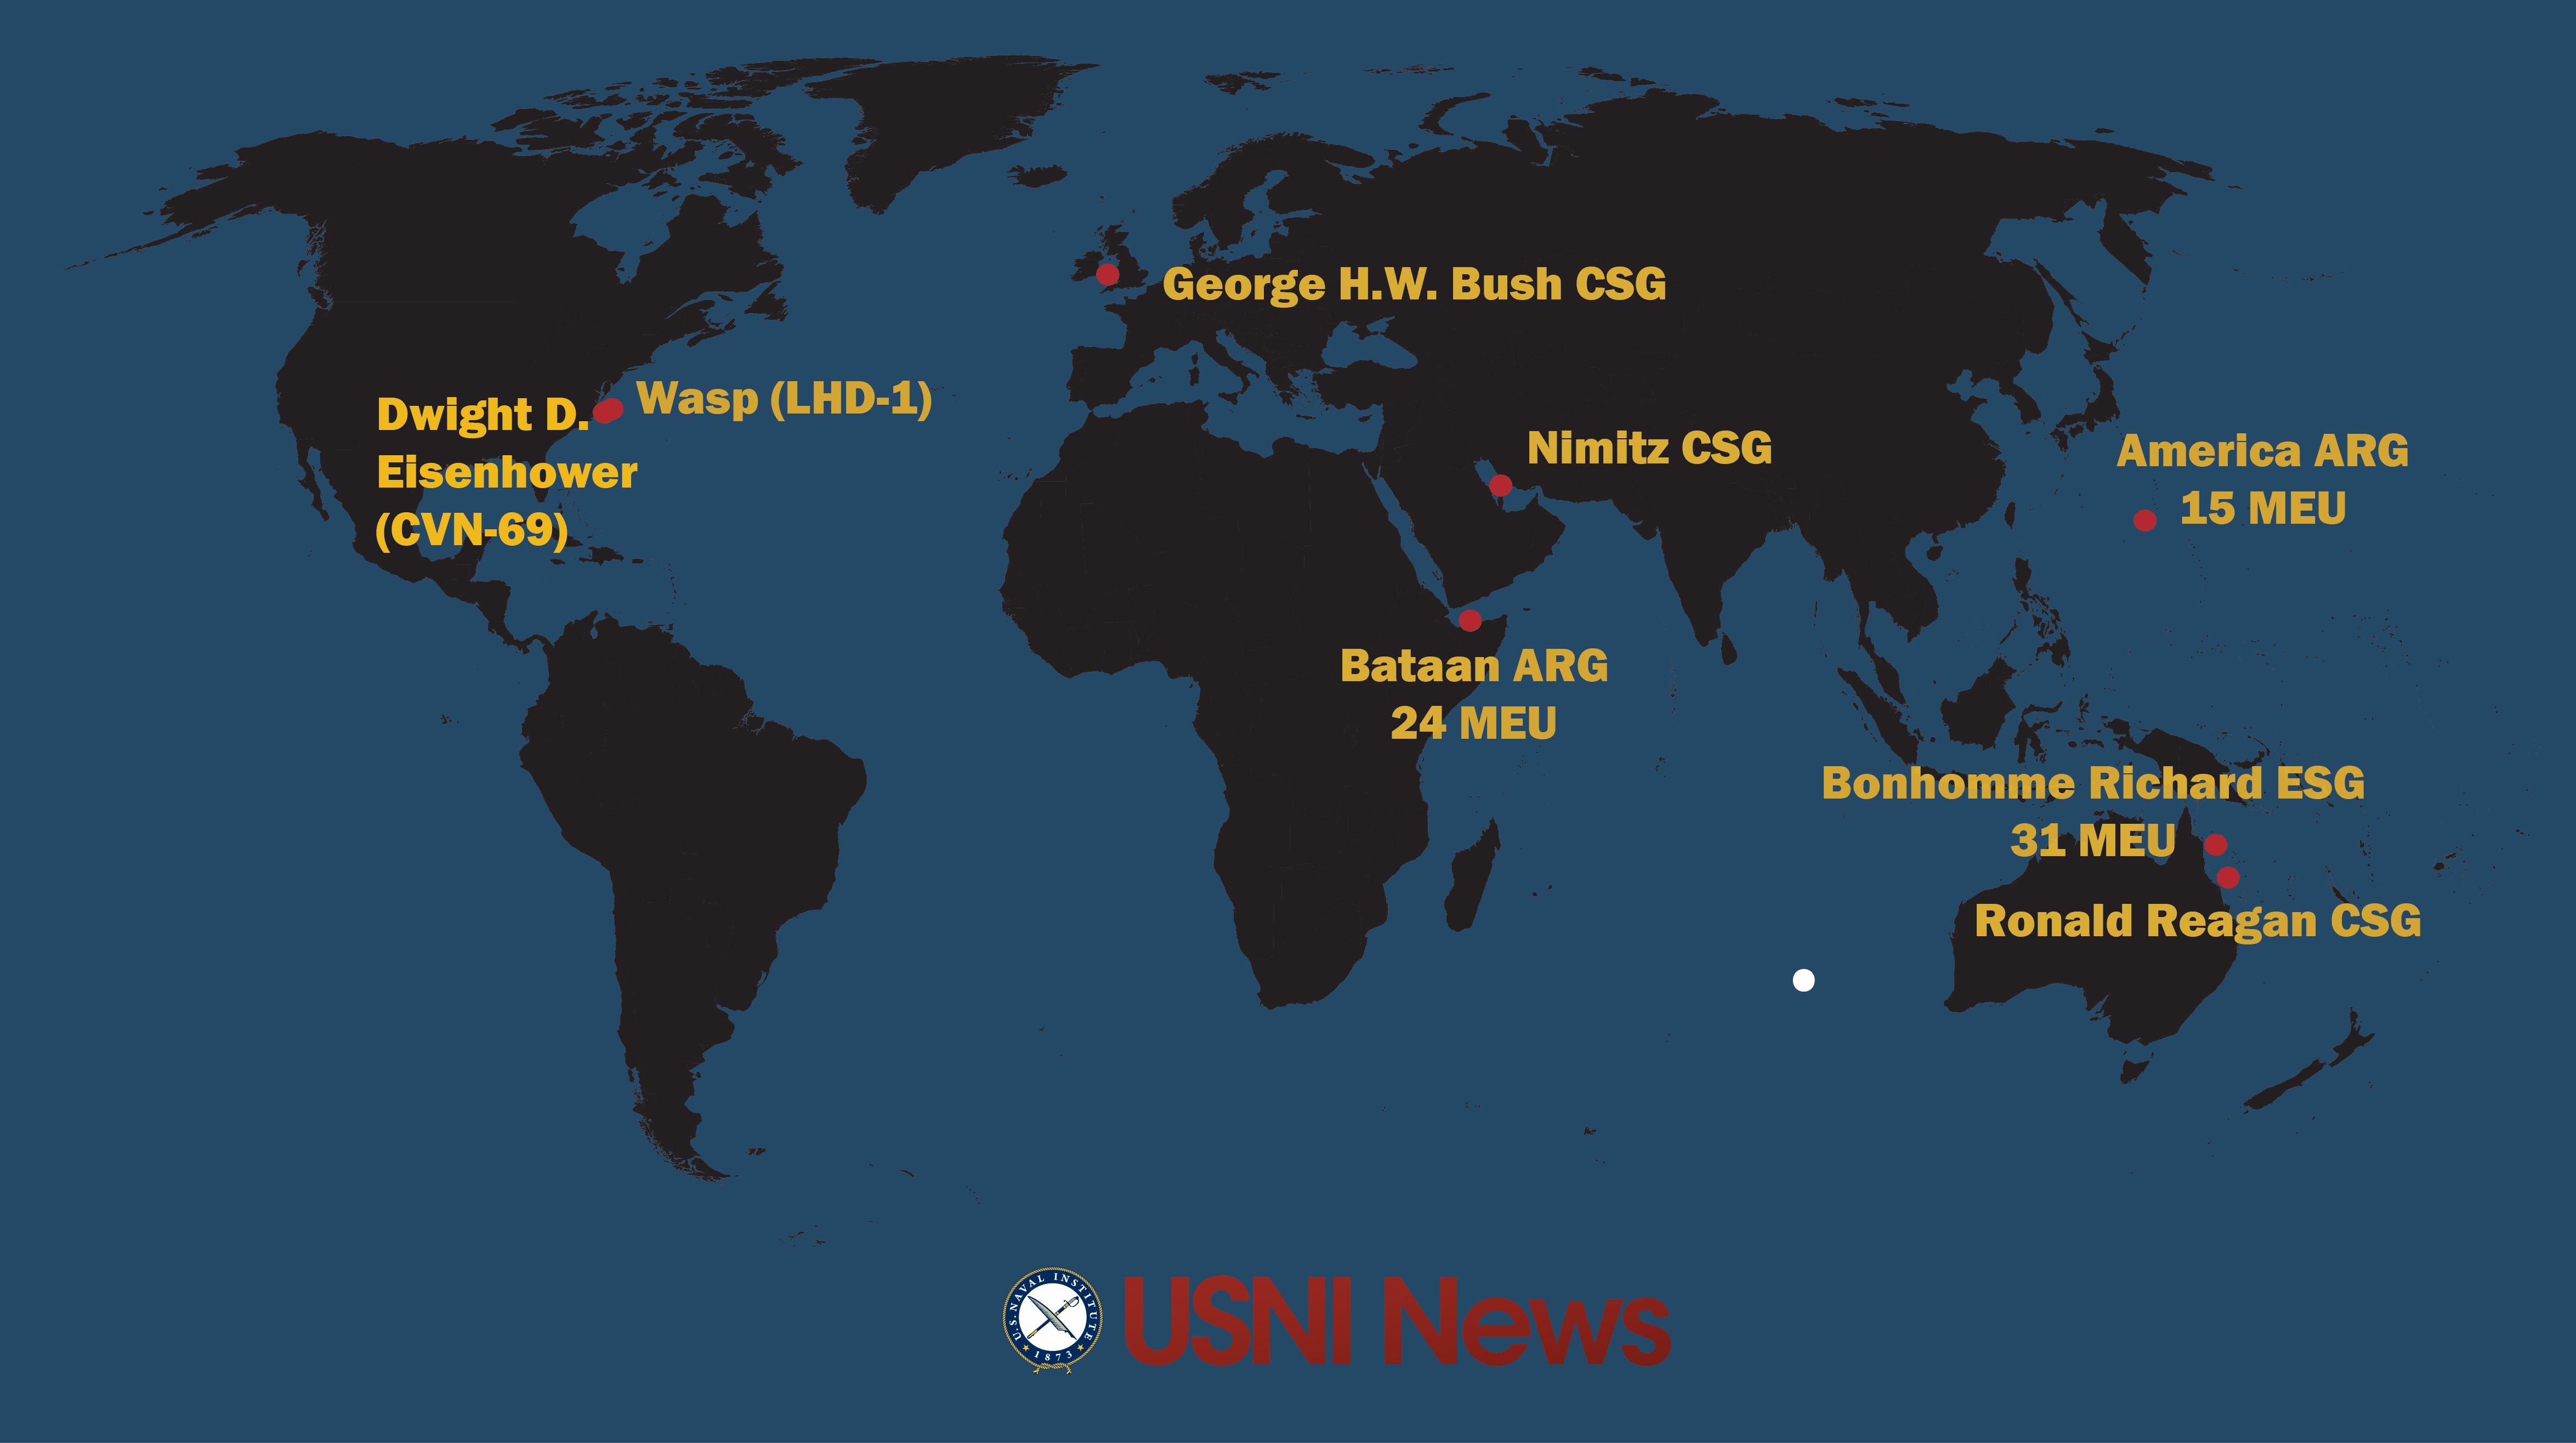 USNI News Fleet And Marine Tracker July USNI News - 2017 july 31